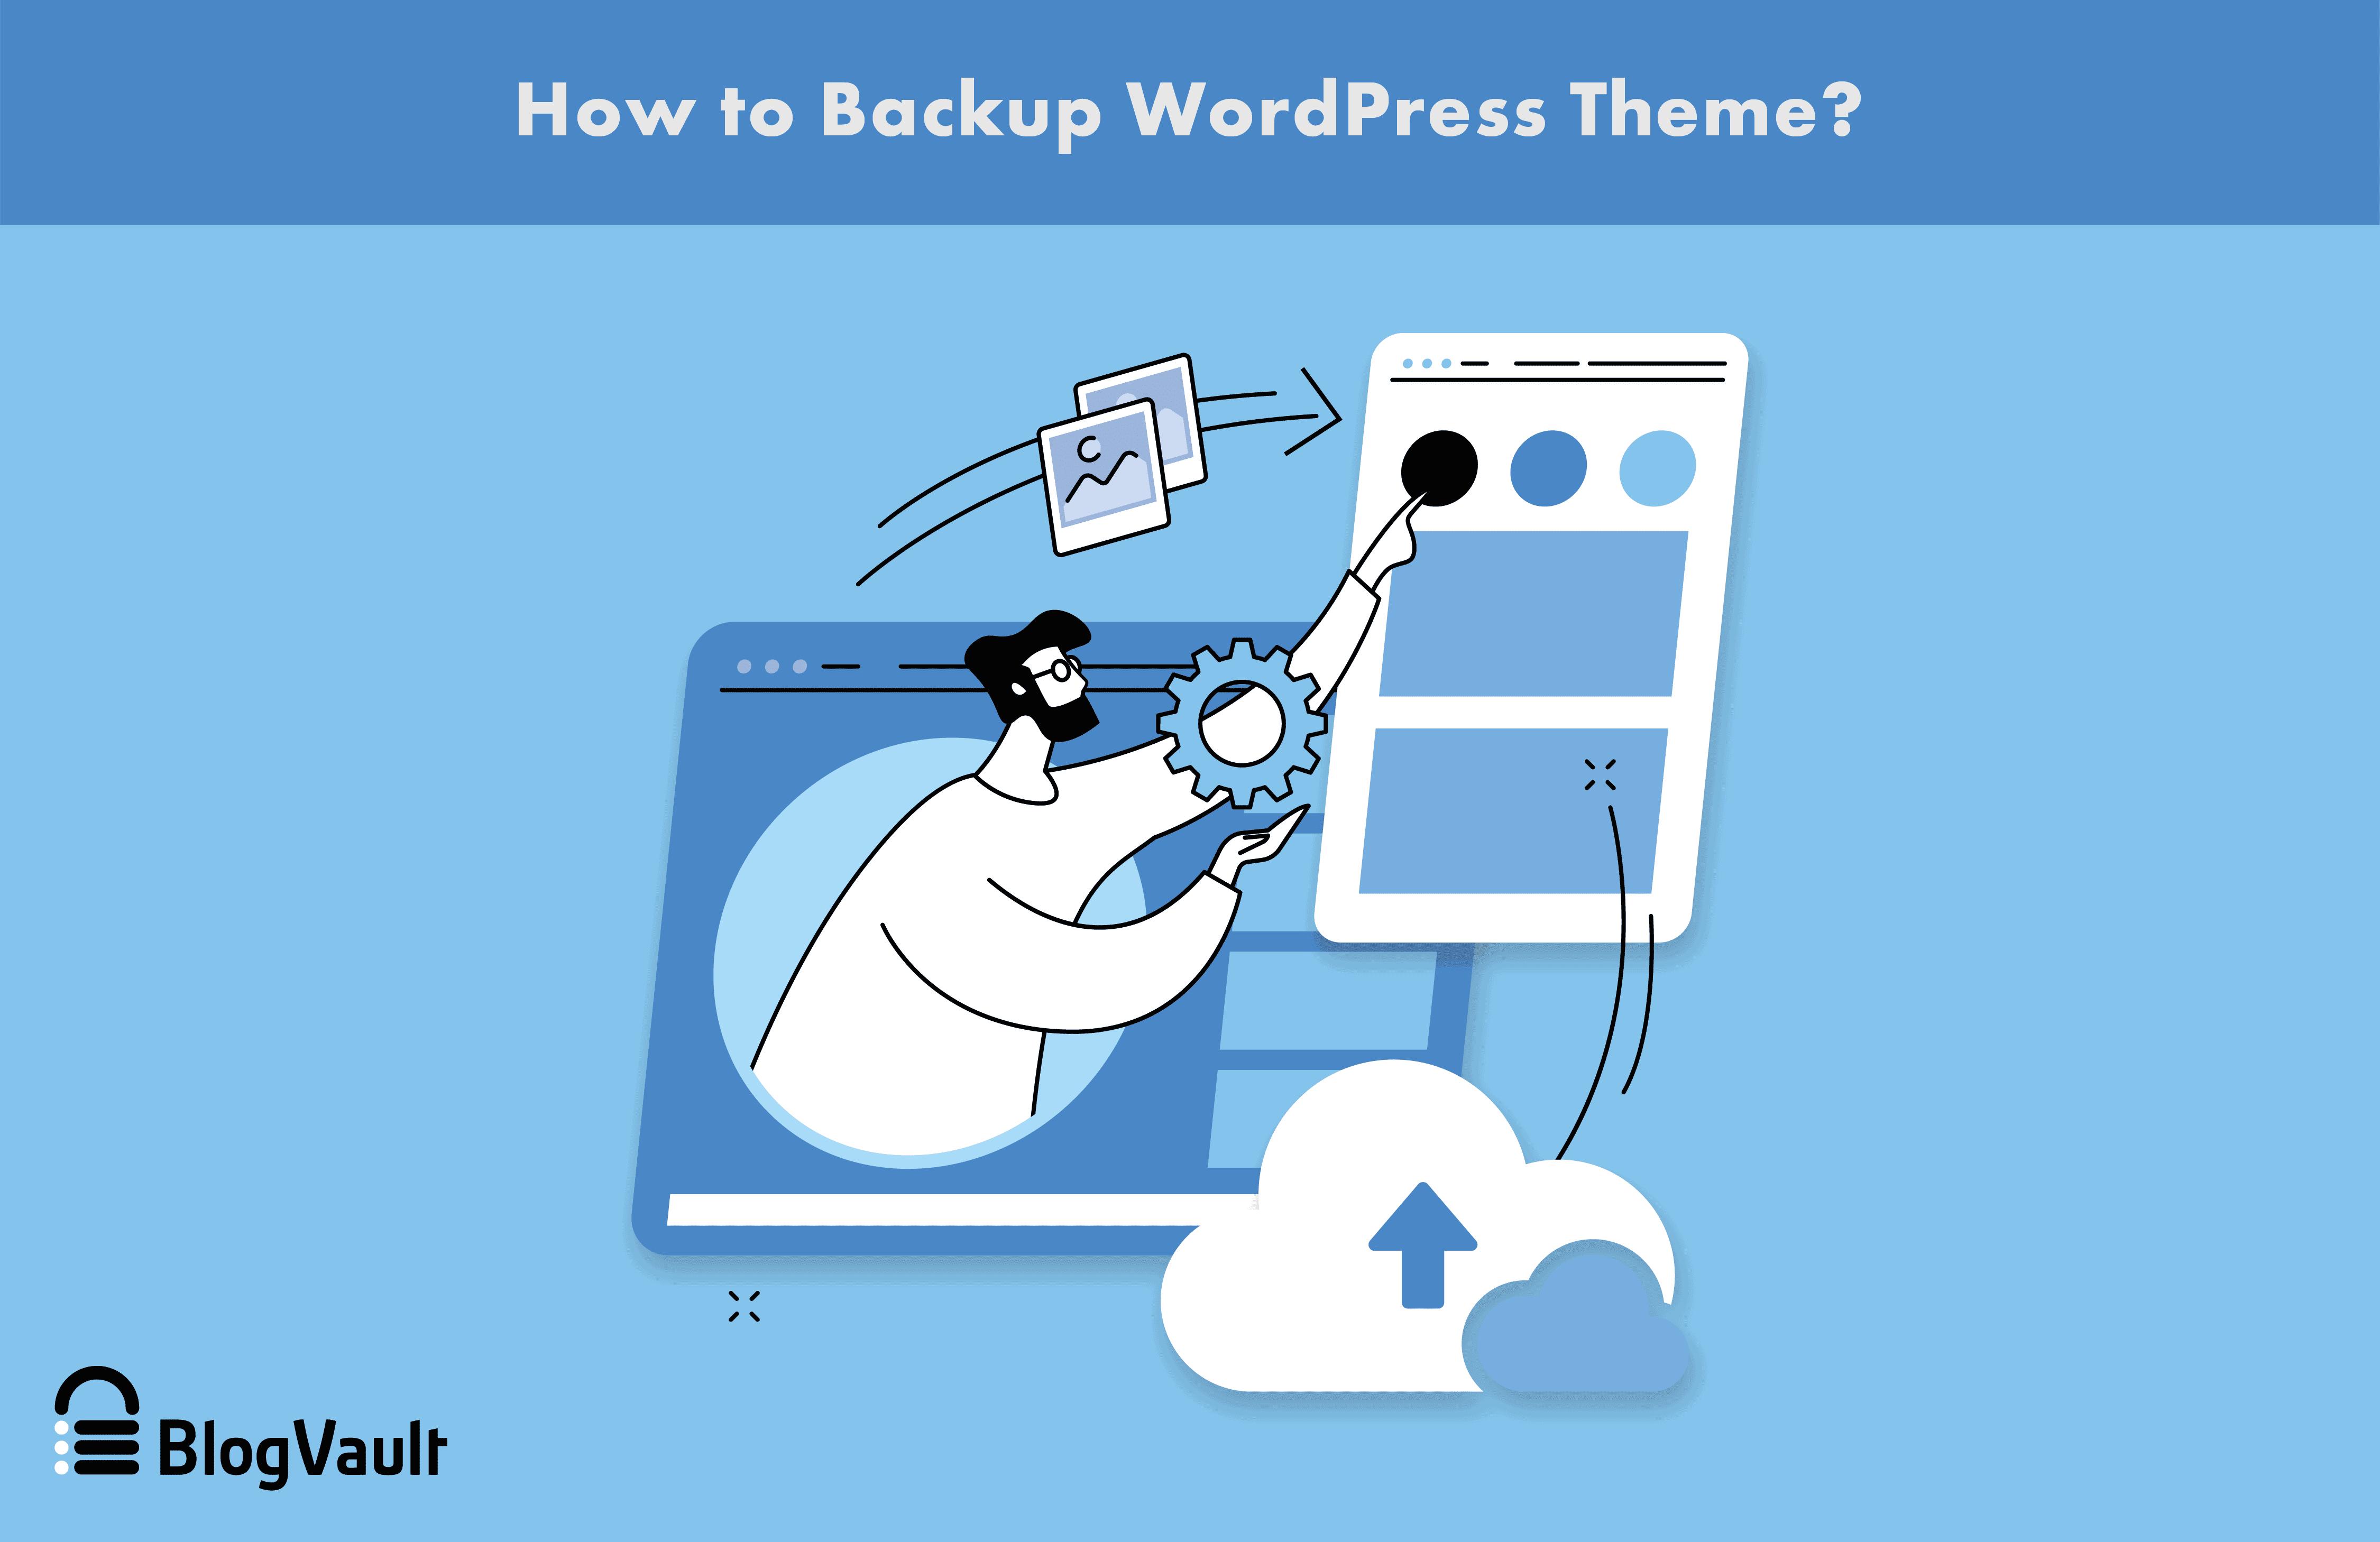 How to backup wordpress theme?